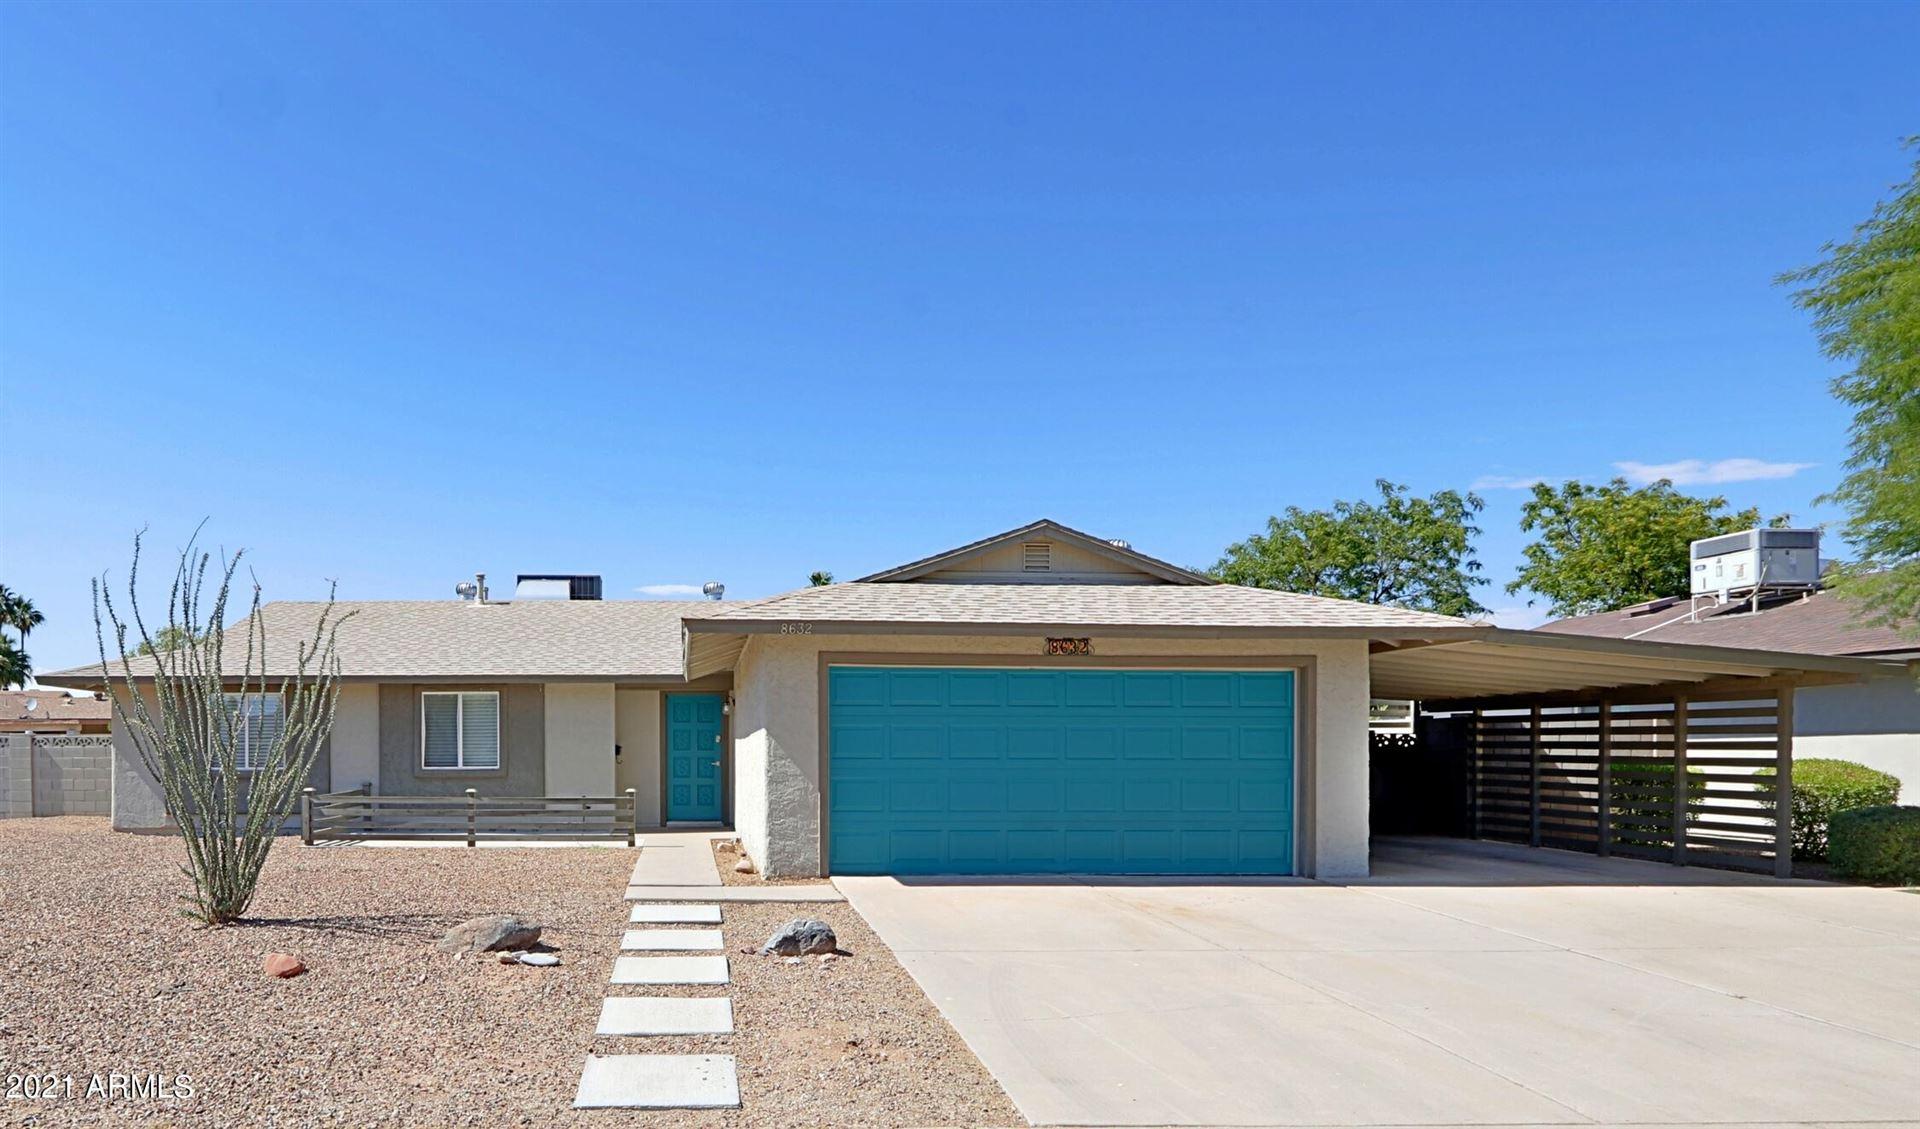 Photo of 8632 E COLUMBUS Avenue, Scottsdale, AZ 85251 (MLS # 6247723)